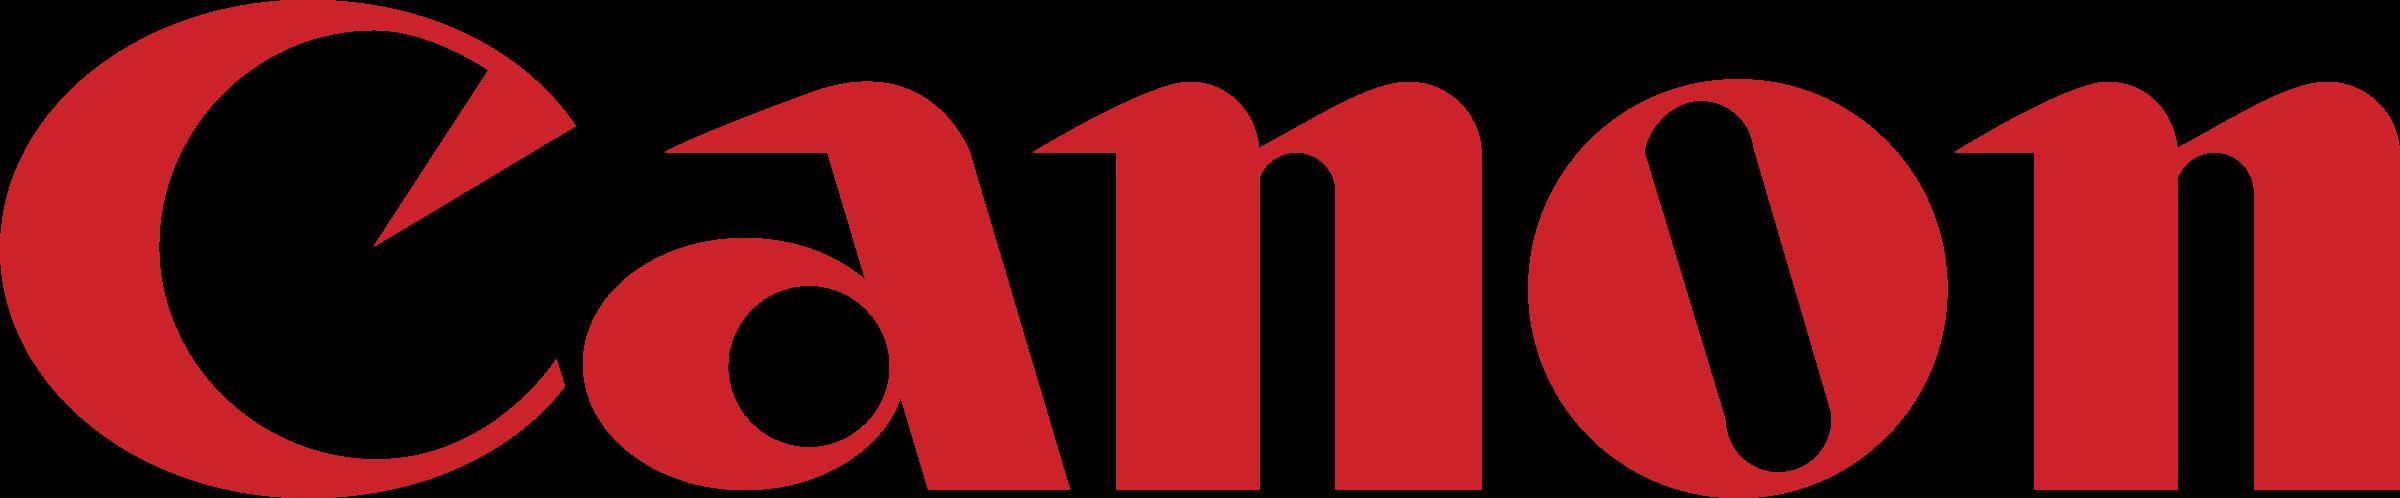 canon-logo-logo-png-transparent.png